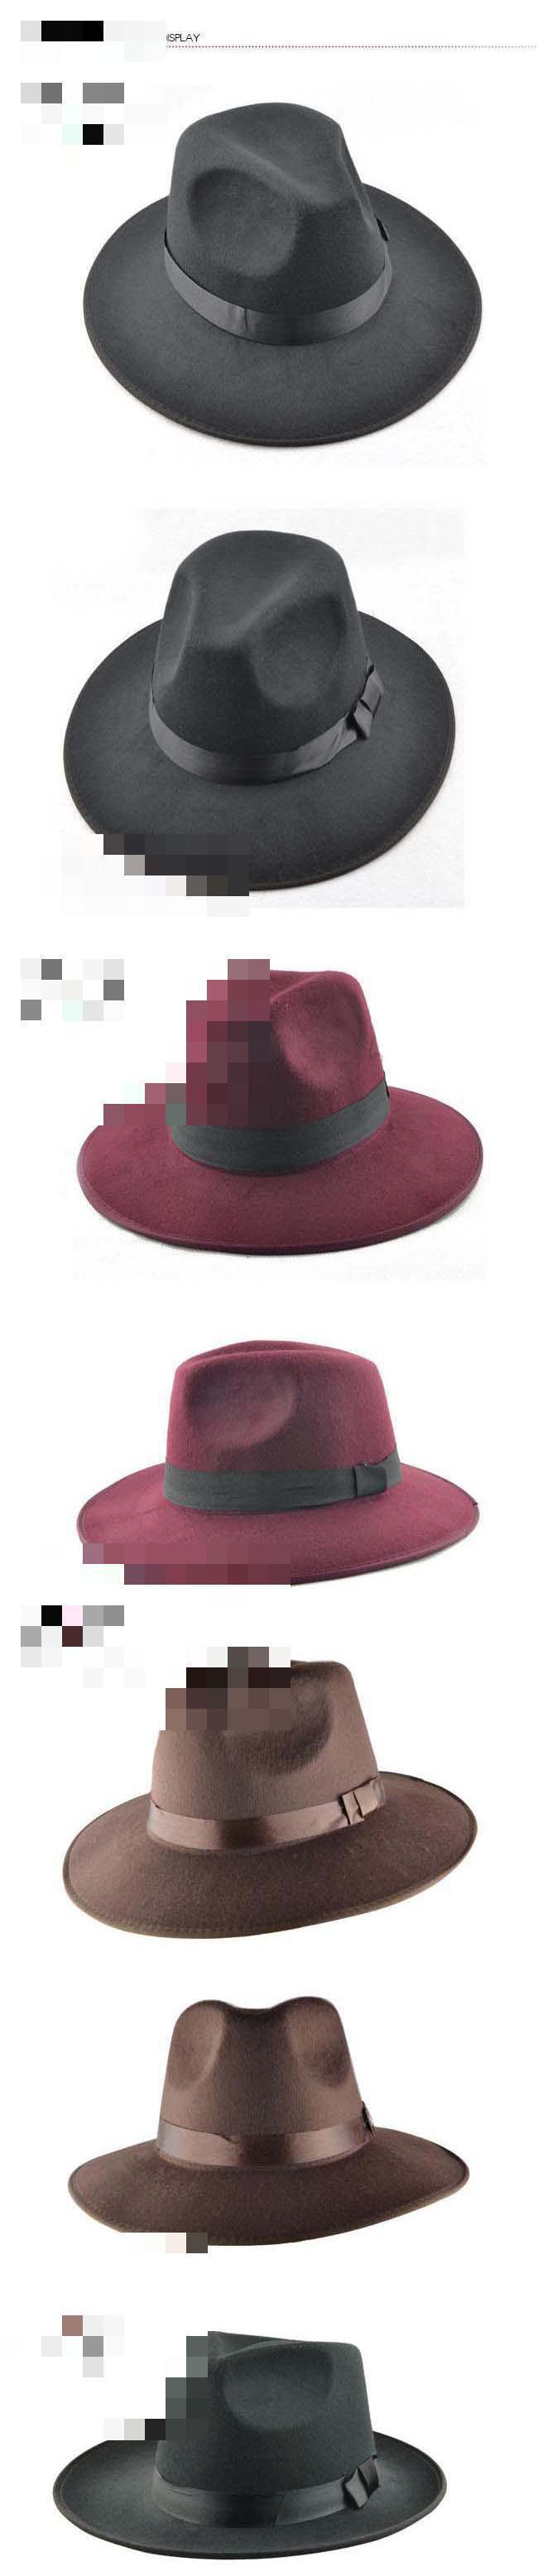 61bd2db0dda 2019 Wholesale YOCCAS Along The Winter Hat Vintage Jazz Cap Stage ...